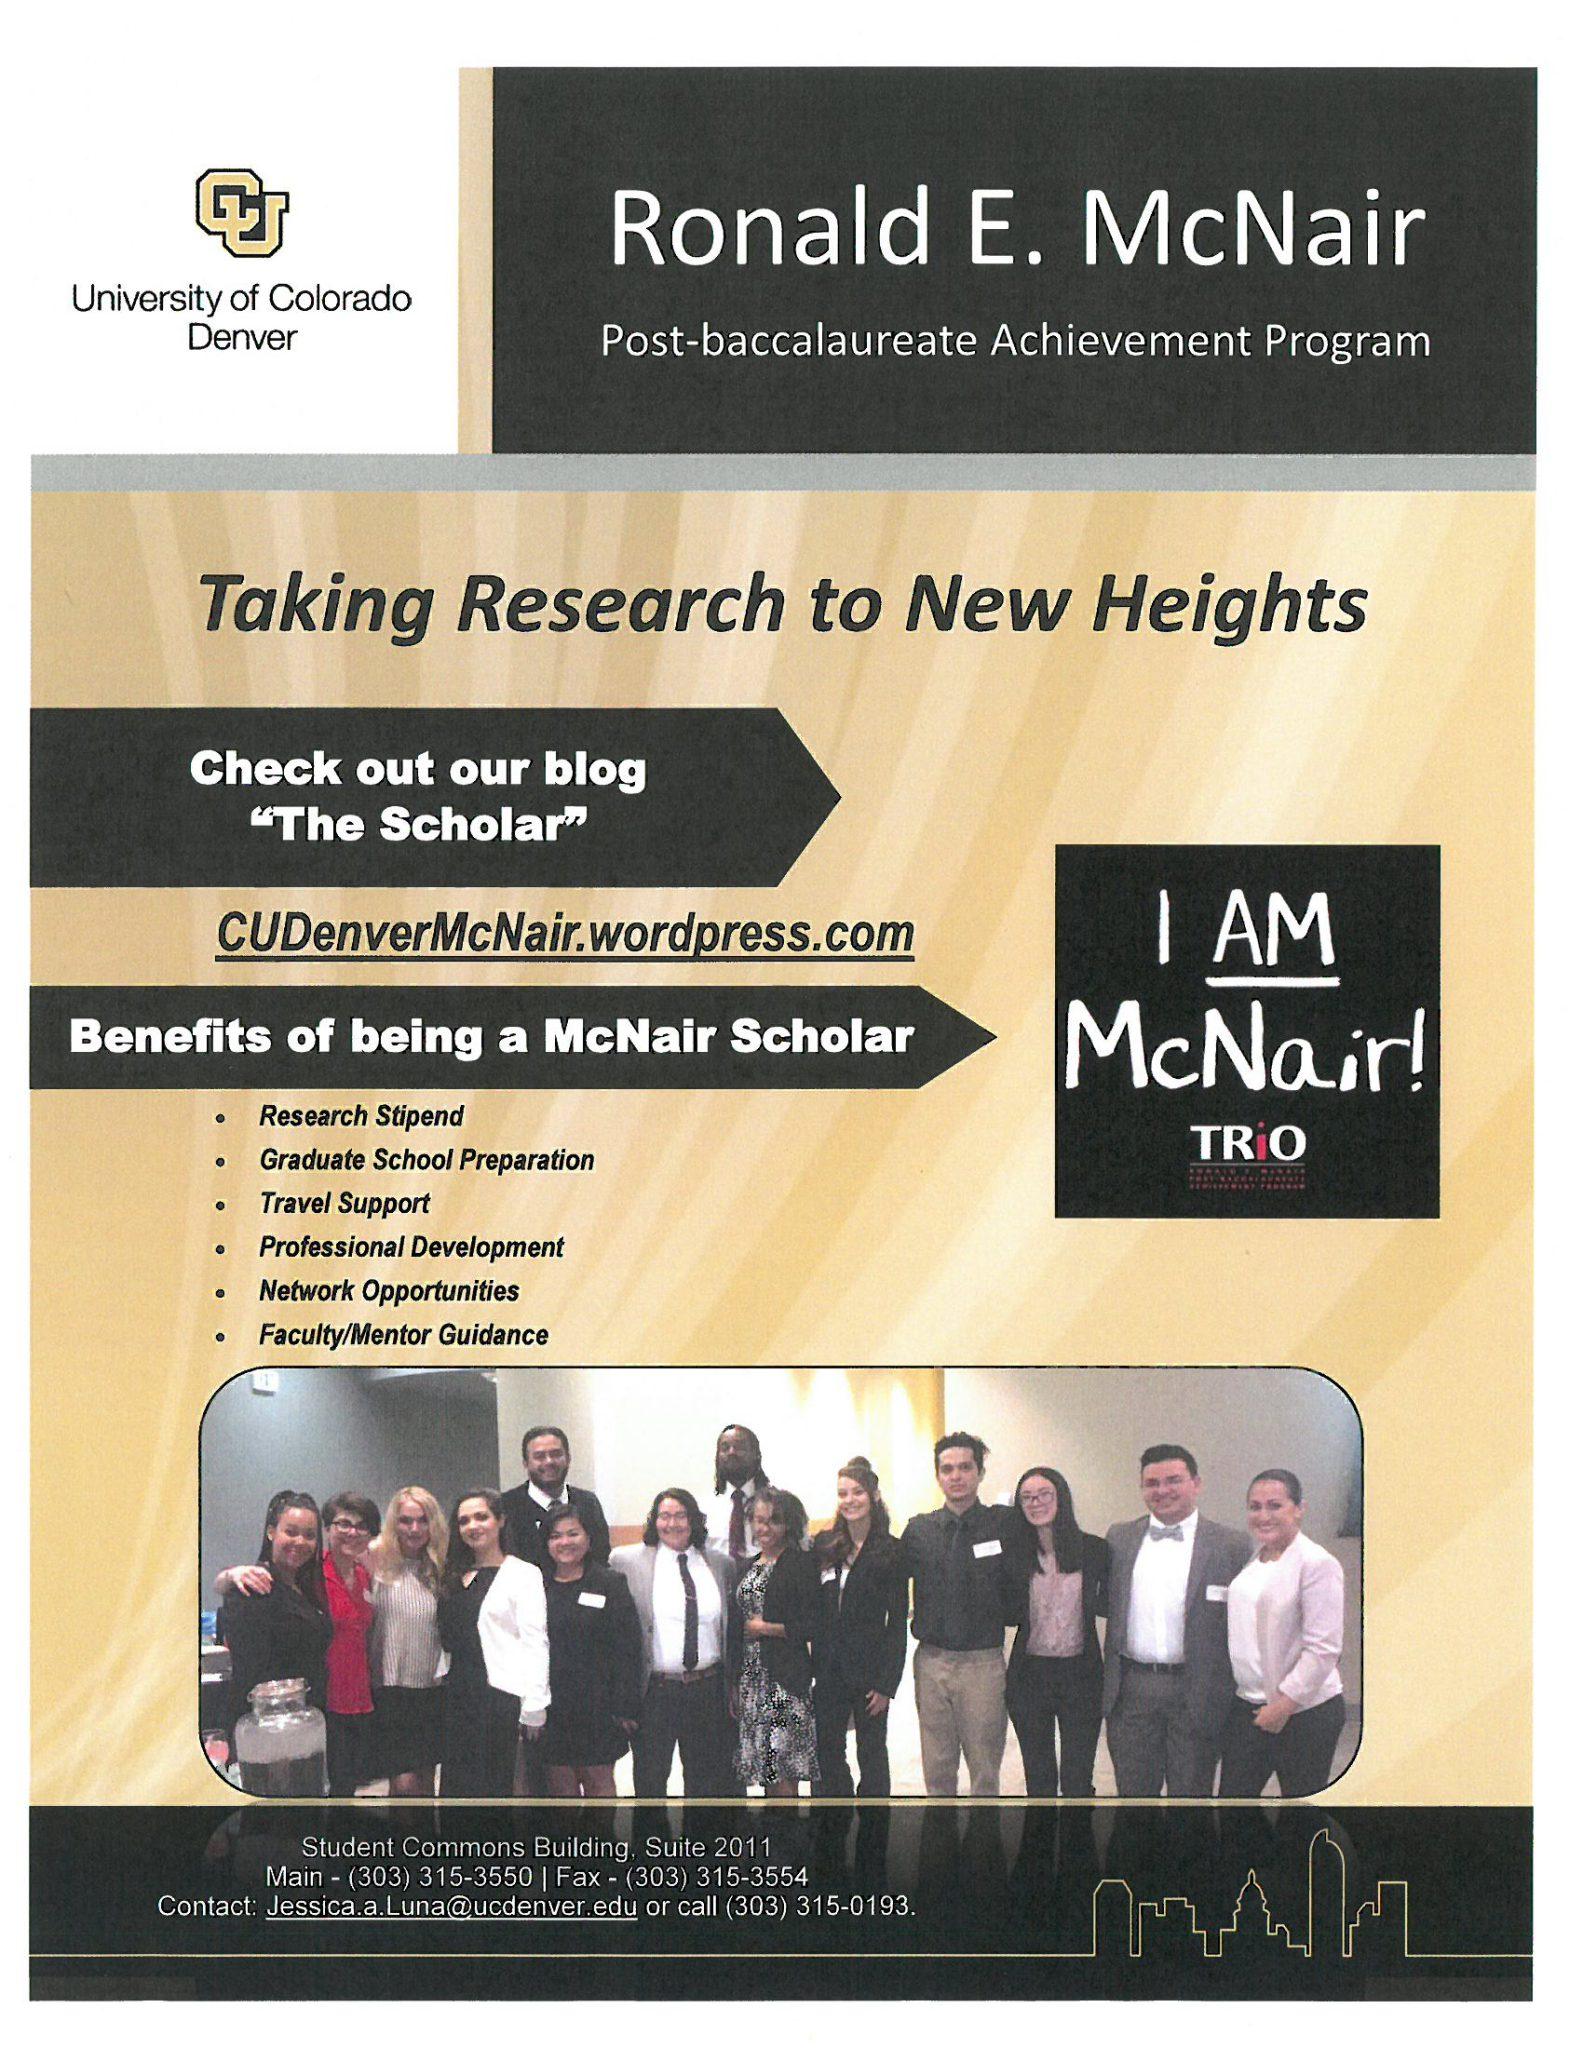 Ronald E. McNair flyer